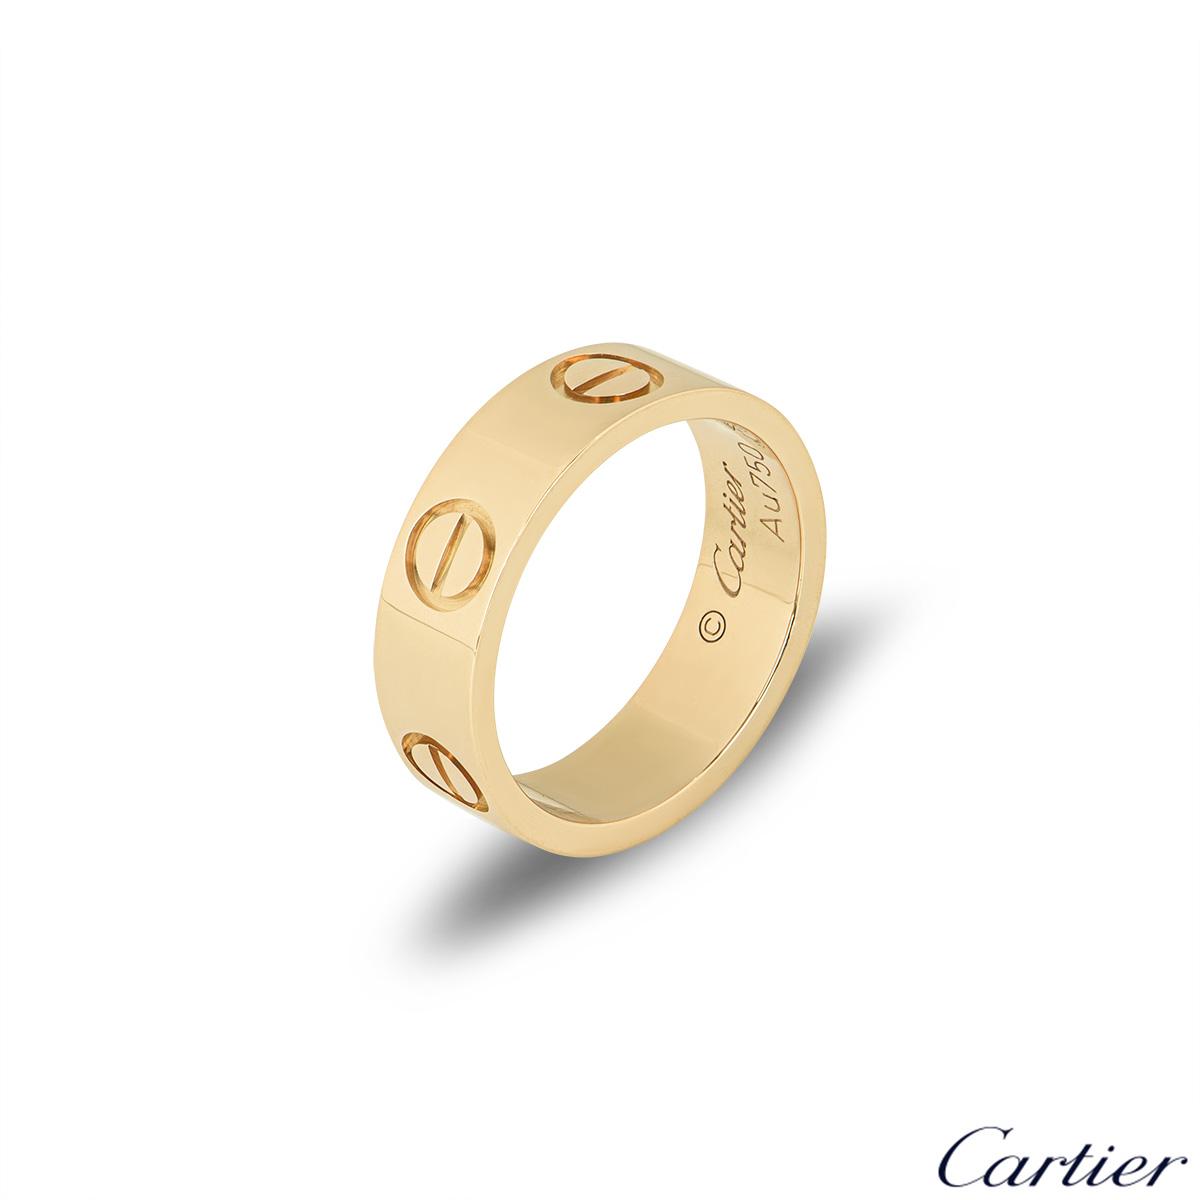 Cartier Yellow Gold Plain Love Ring Size 52 B4084600